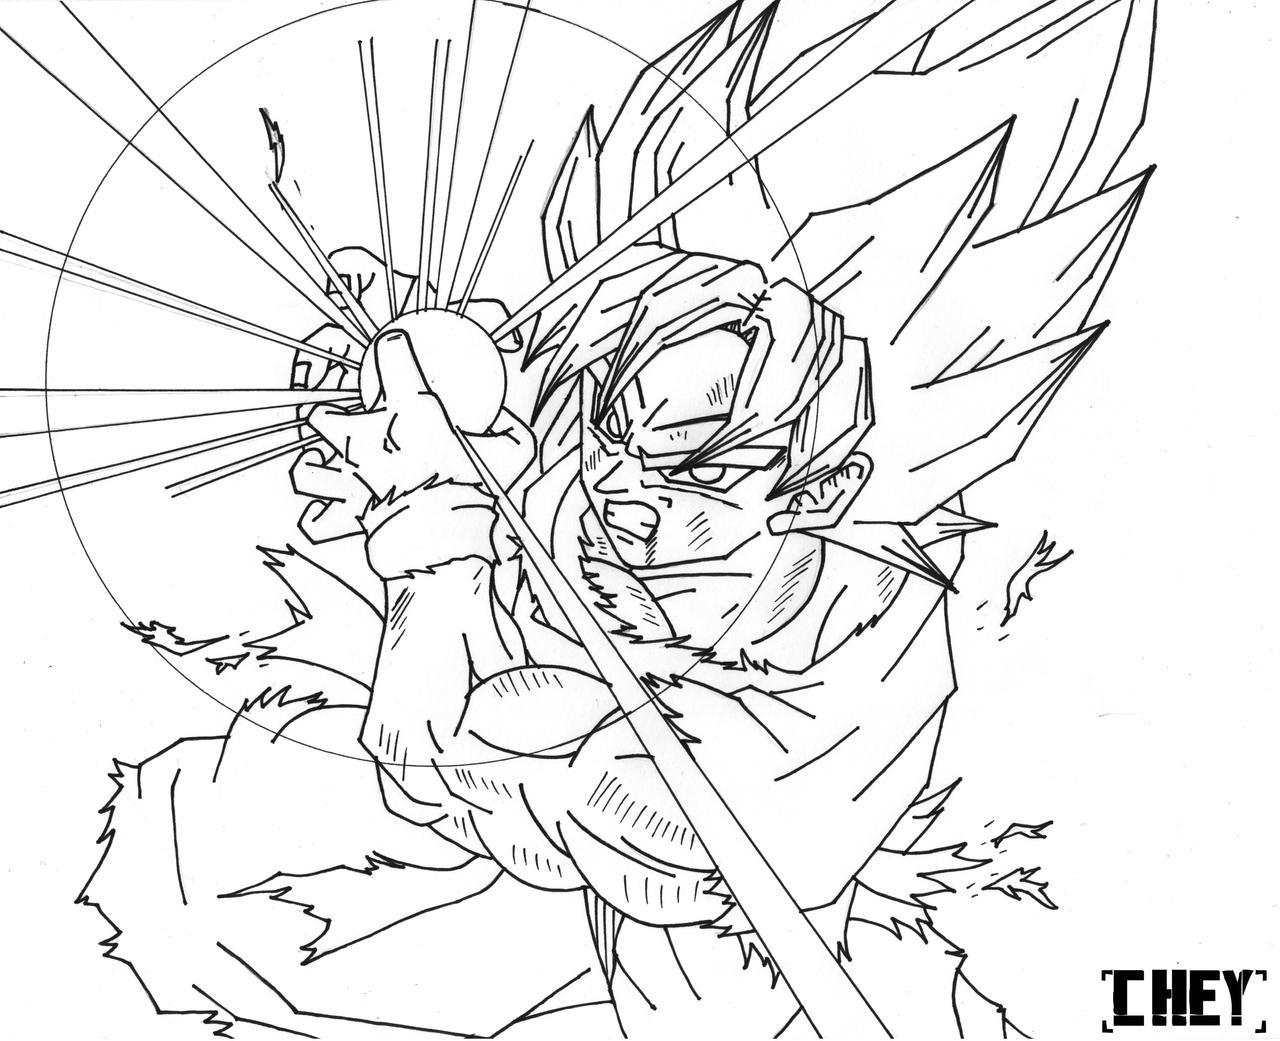 Line Art Vs No Line Art : Goku ssj kamehameha lineart by cheygipe on deviantart